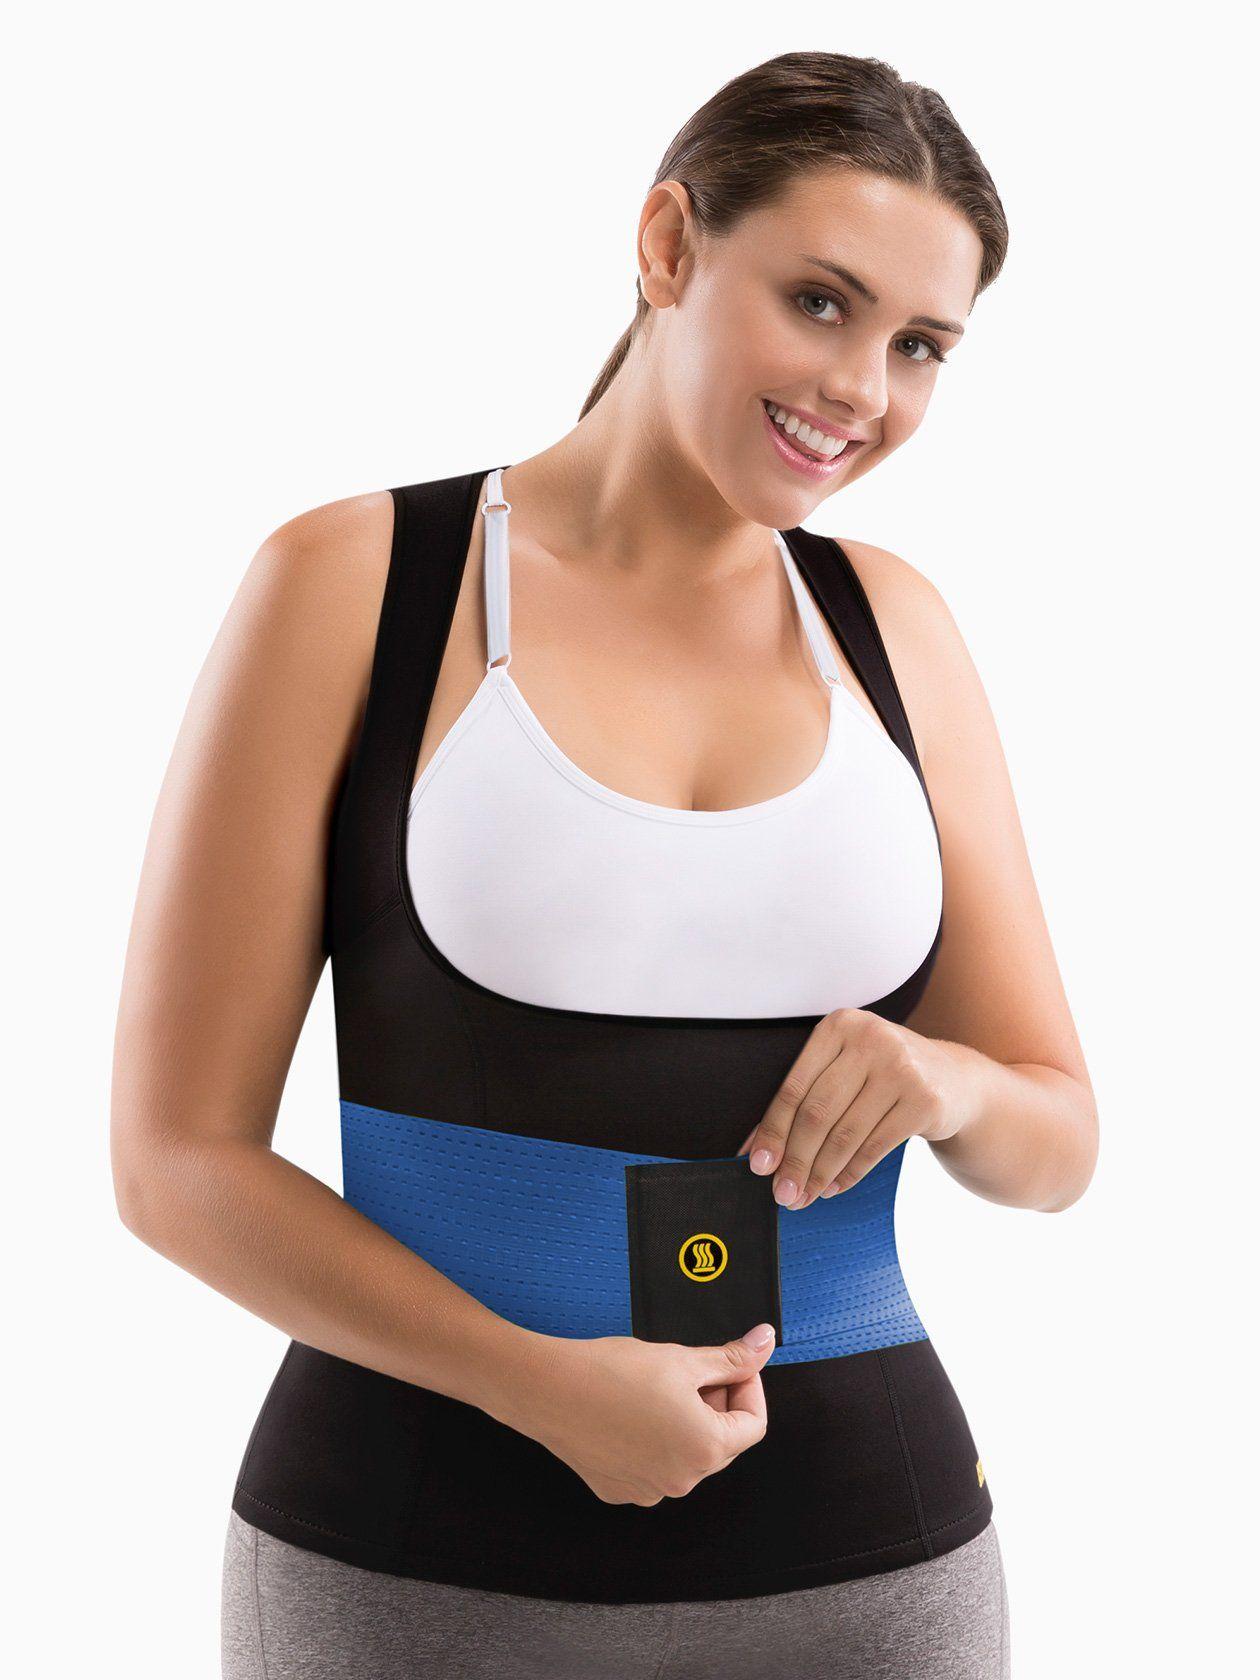 Cami hot blue waist trainer plus cami hot waist